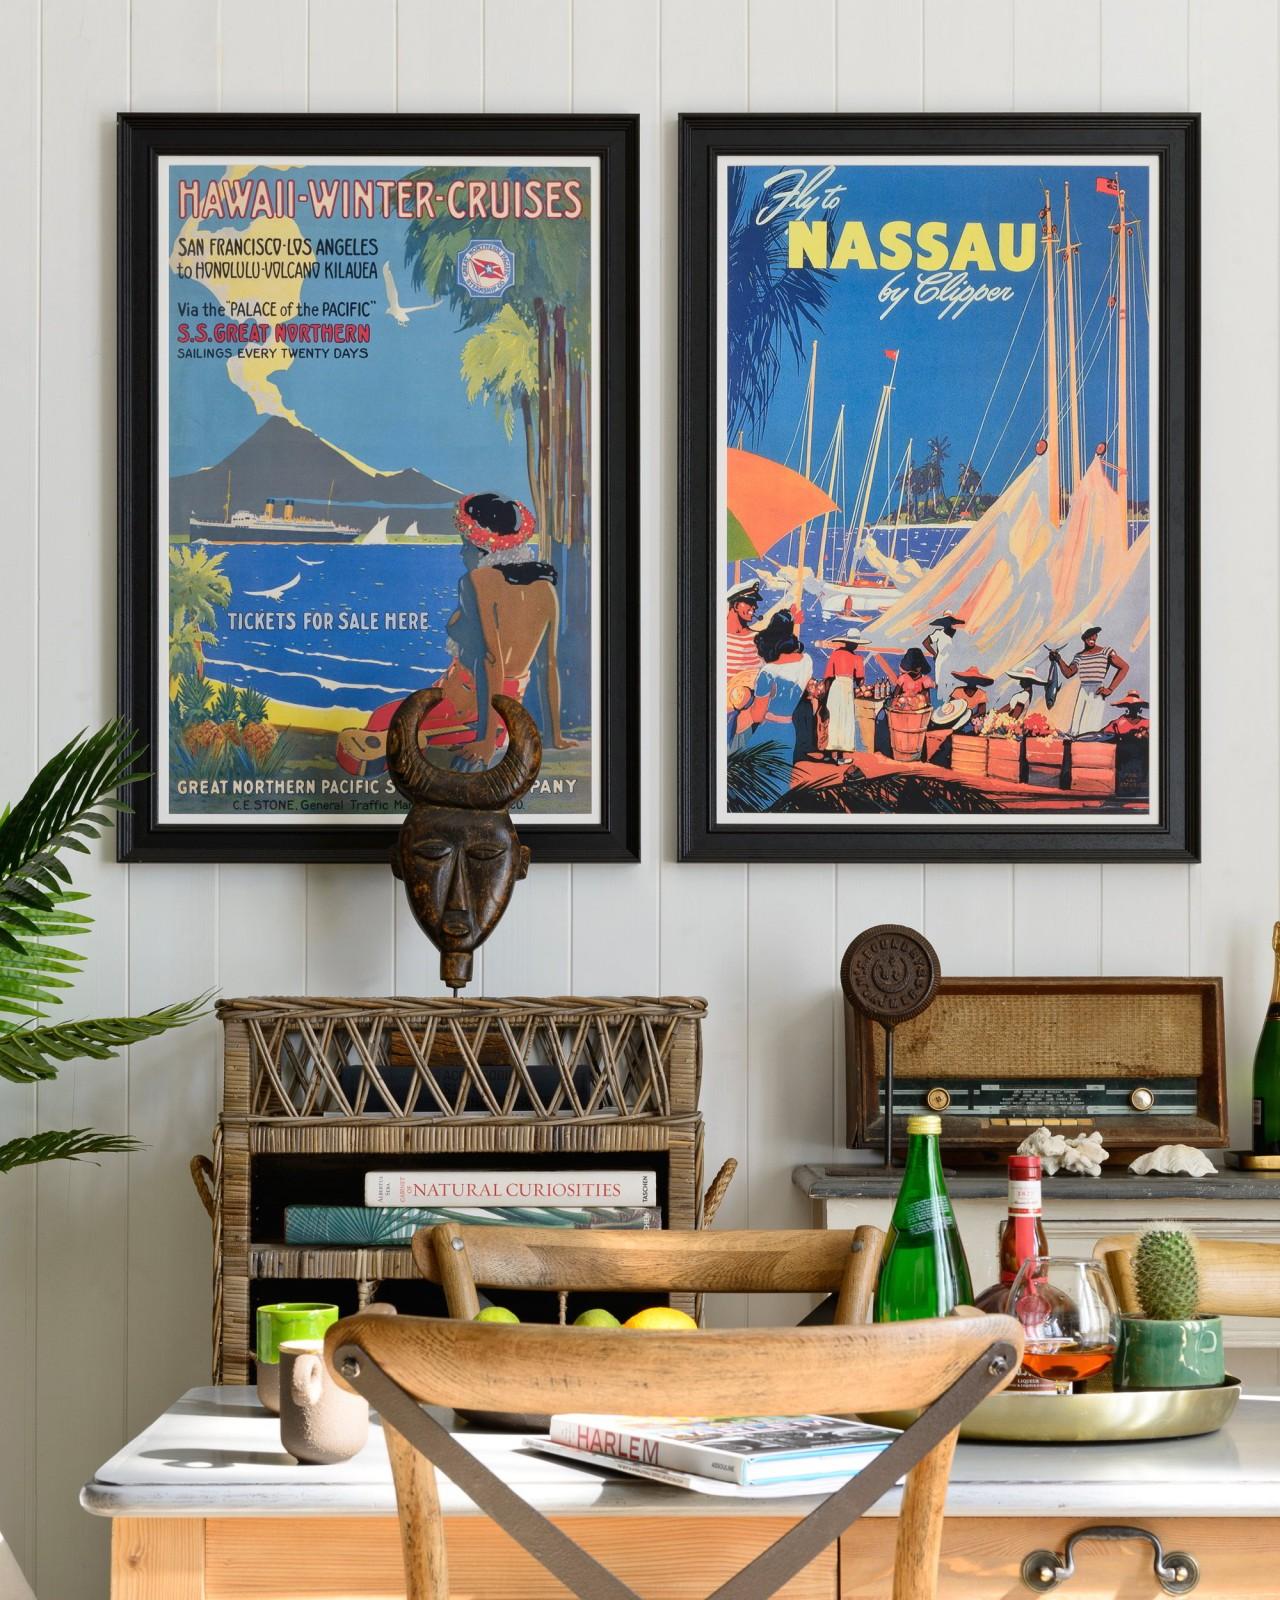 CARIBBEAN TRAVELS - FLY TO NASSAU Framed Art